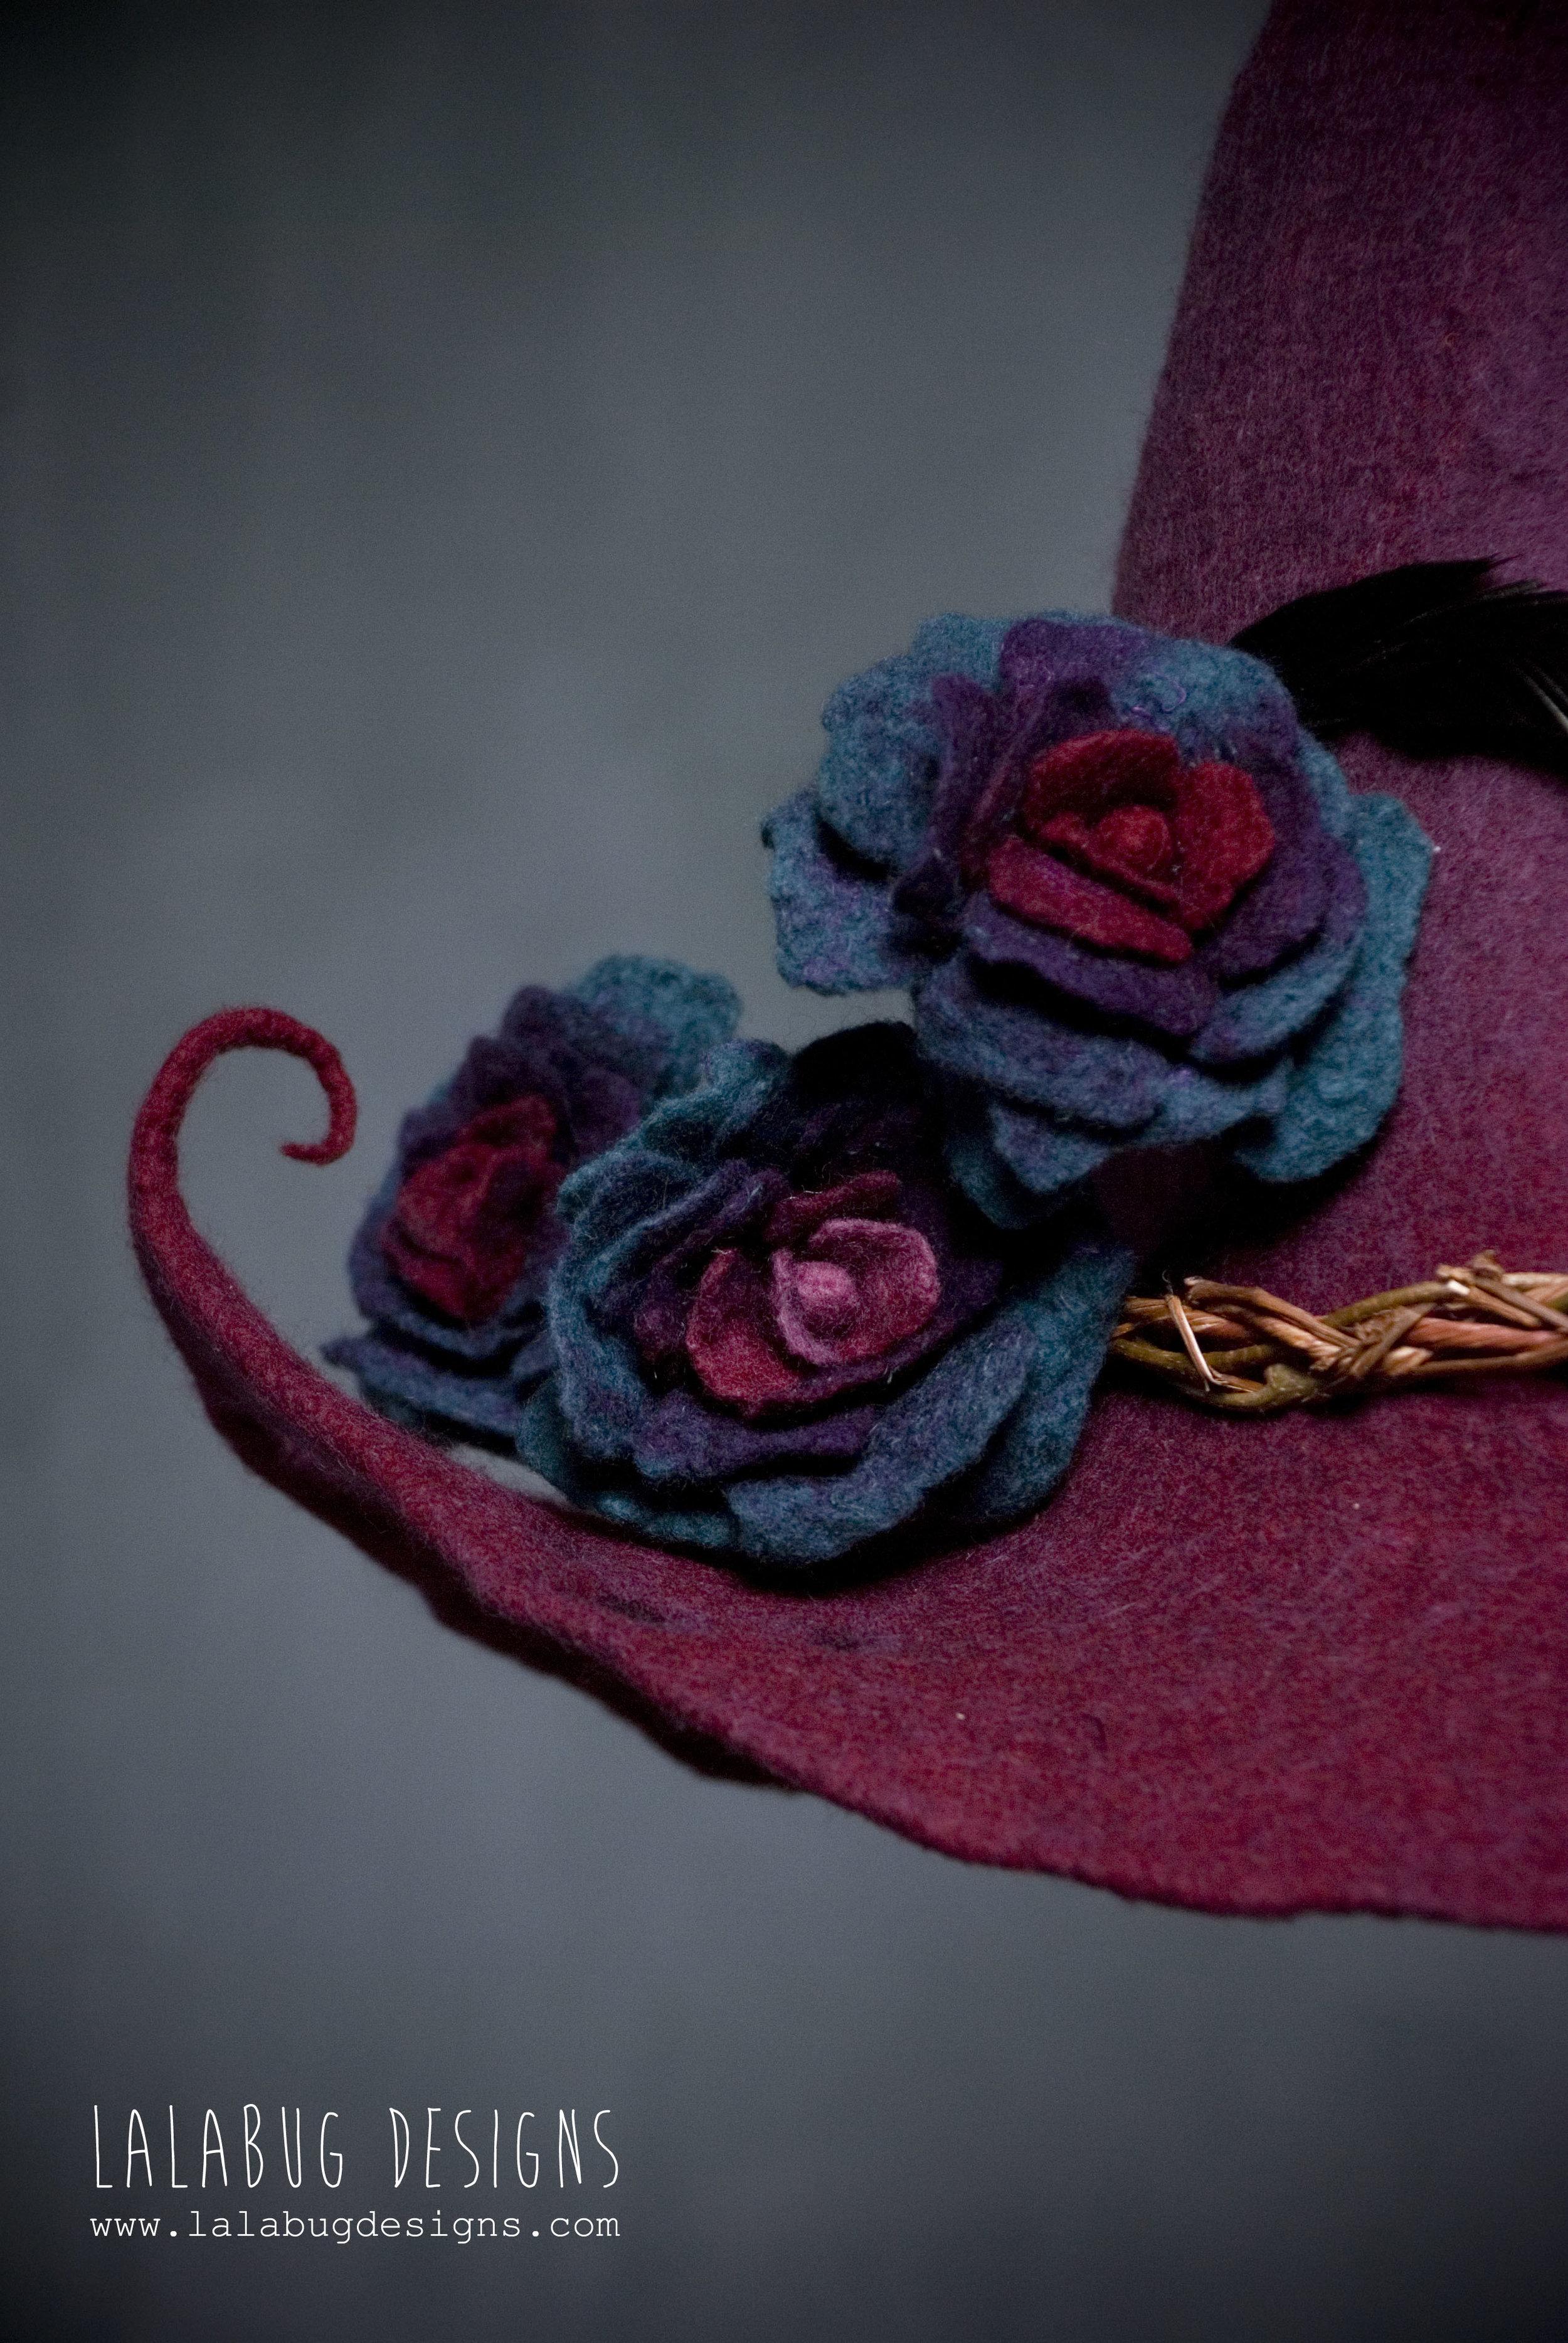 witch-rose1.jpg